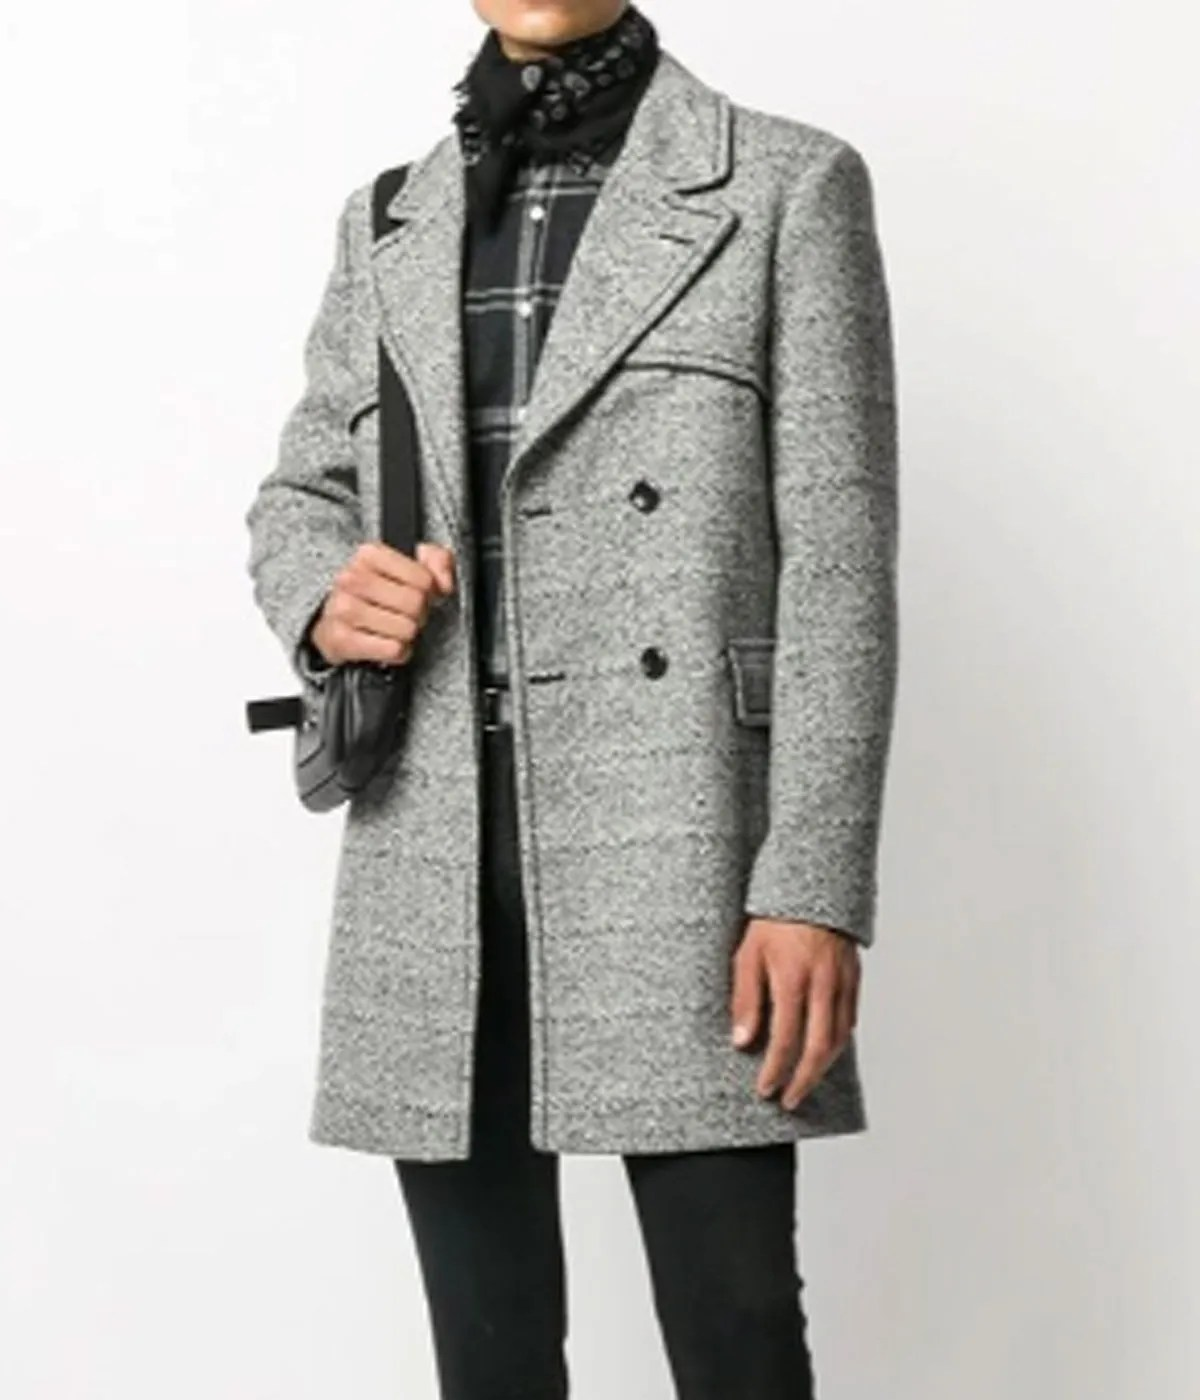 sam-adegoke-dynasty-jeff-colby-coat